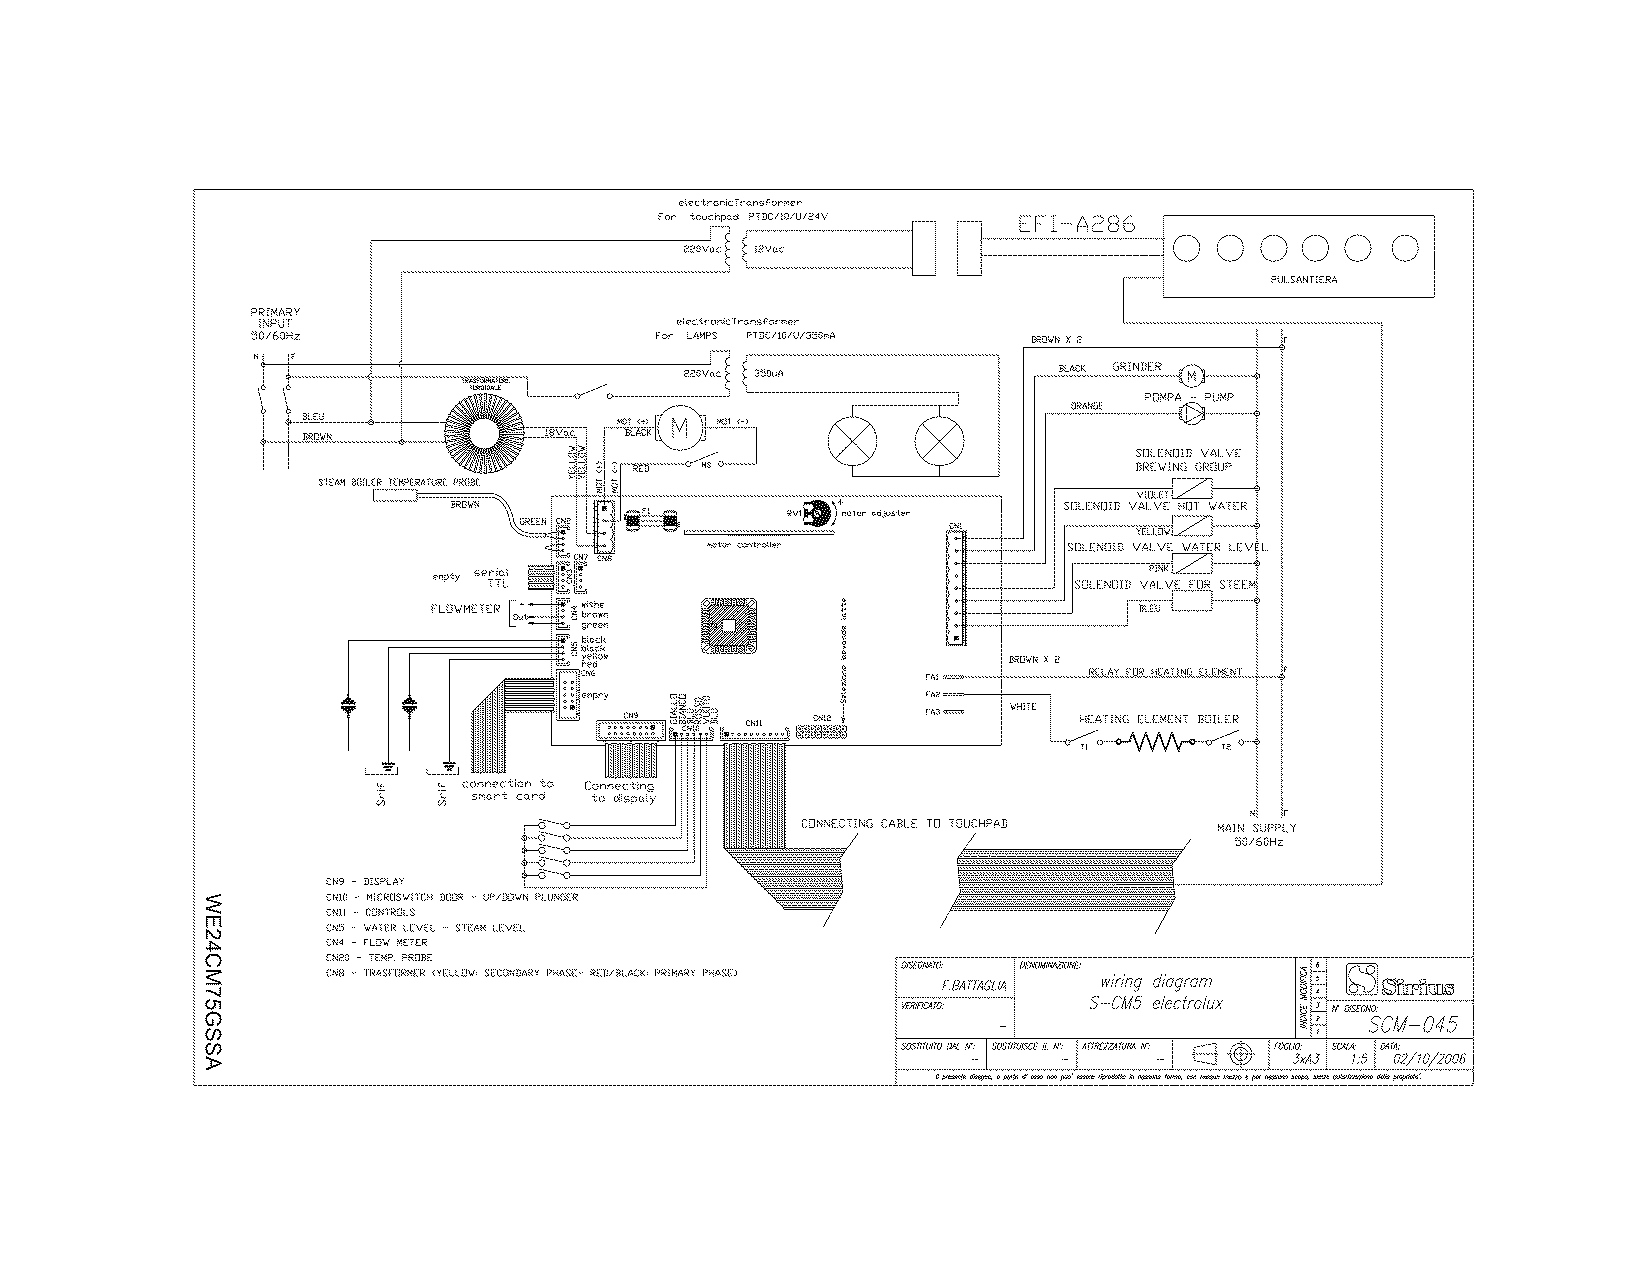 32 coffee vending machine circuit diagram